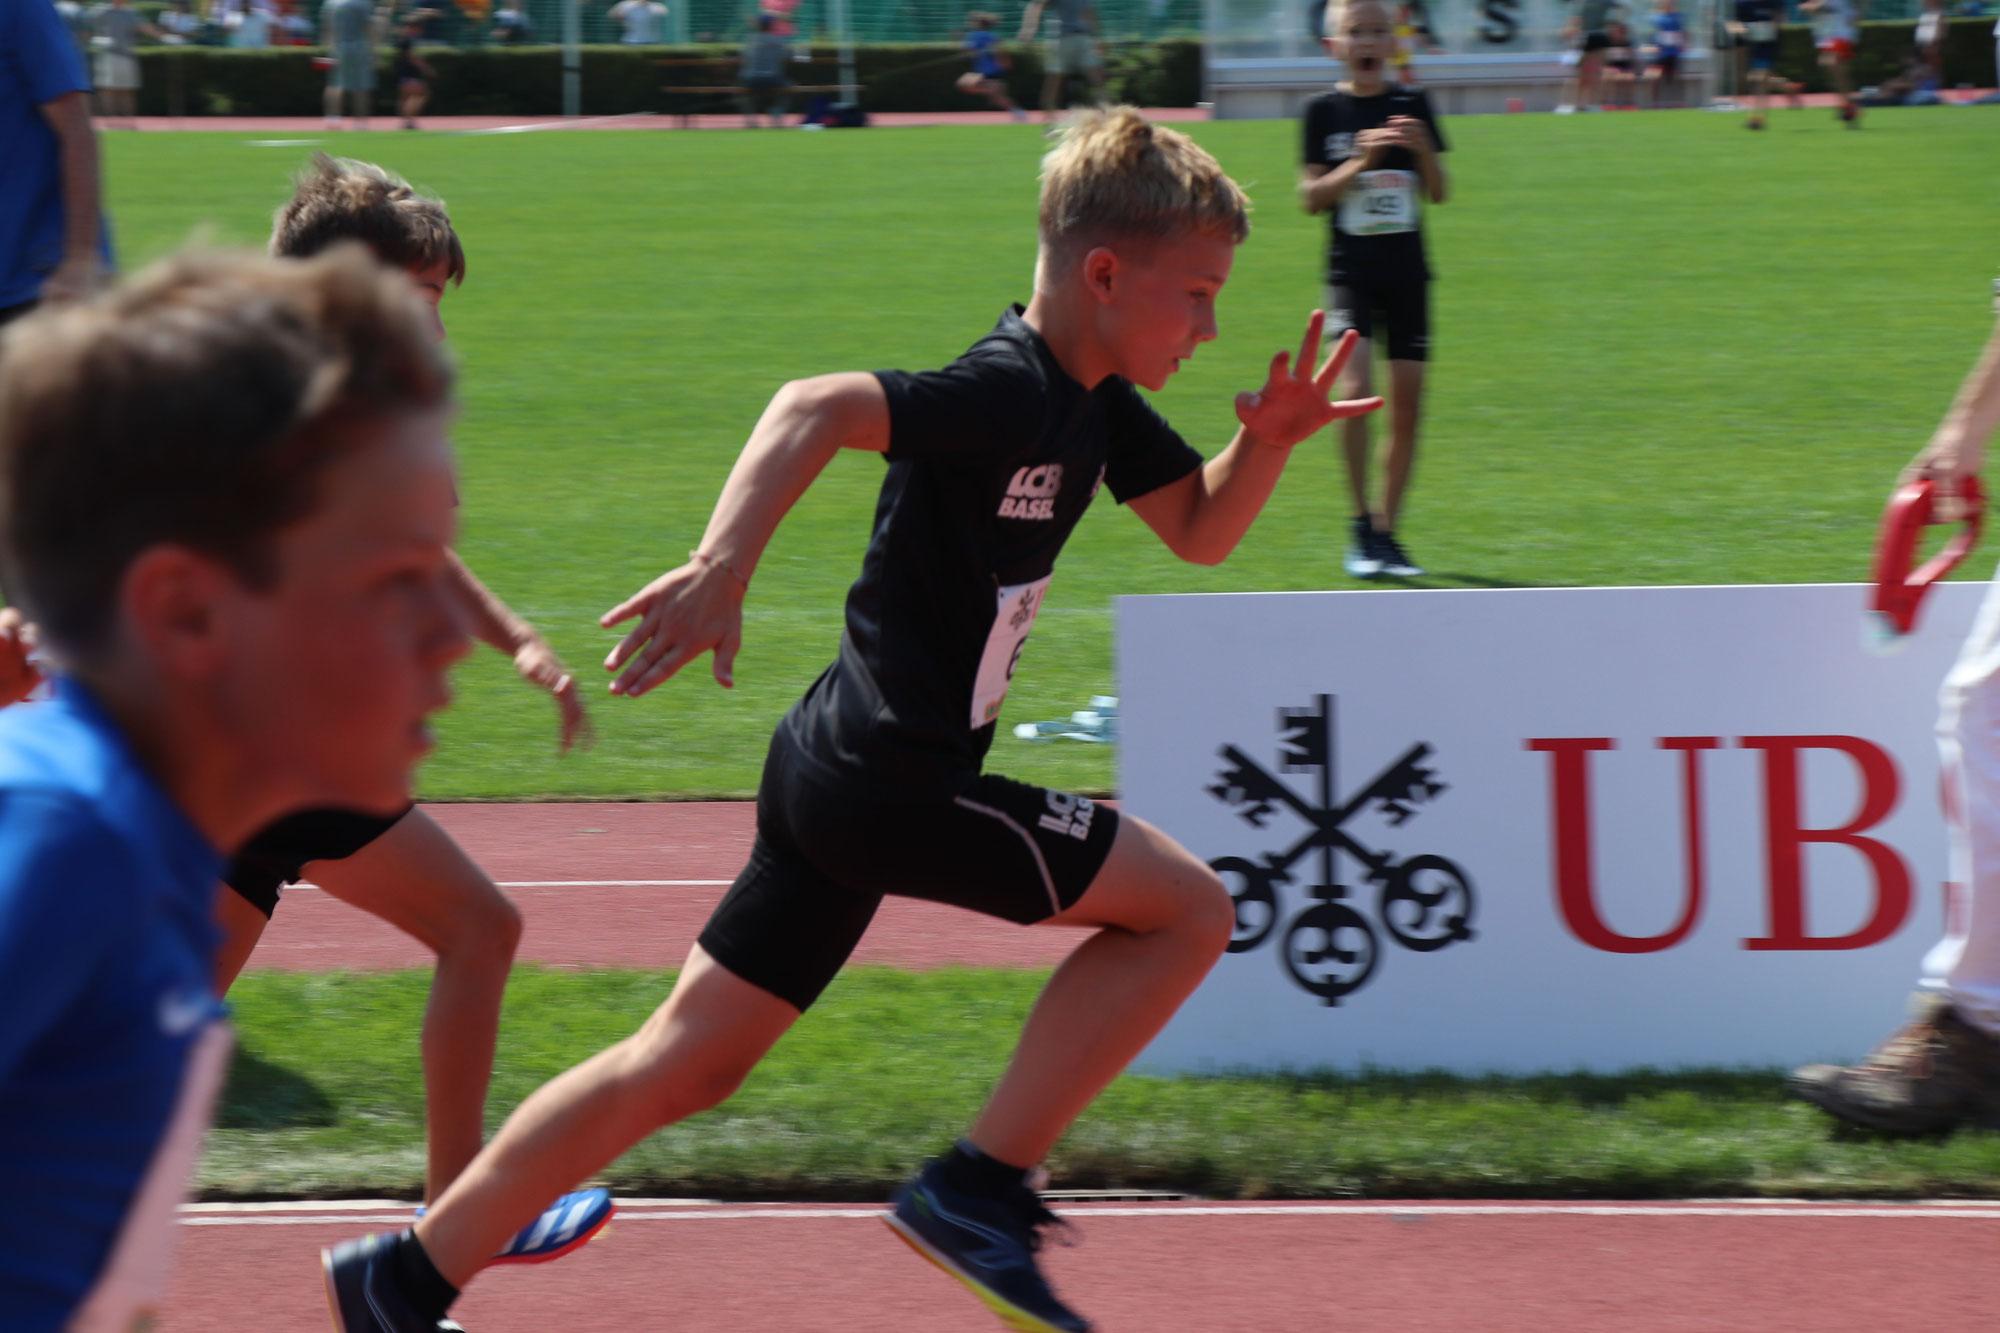 UBS Kids Cup Kantonalfinal in Riehen 2021